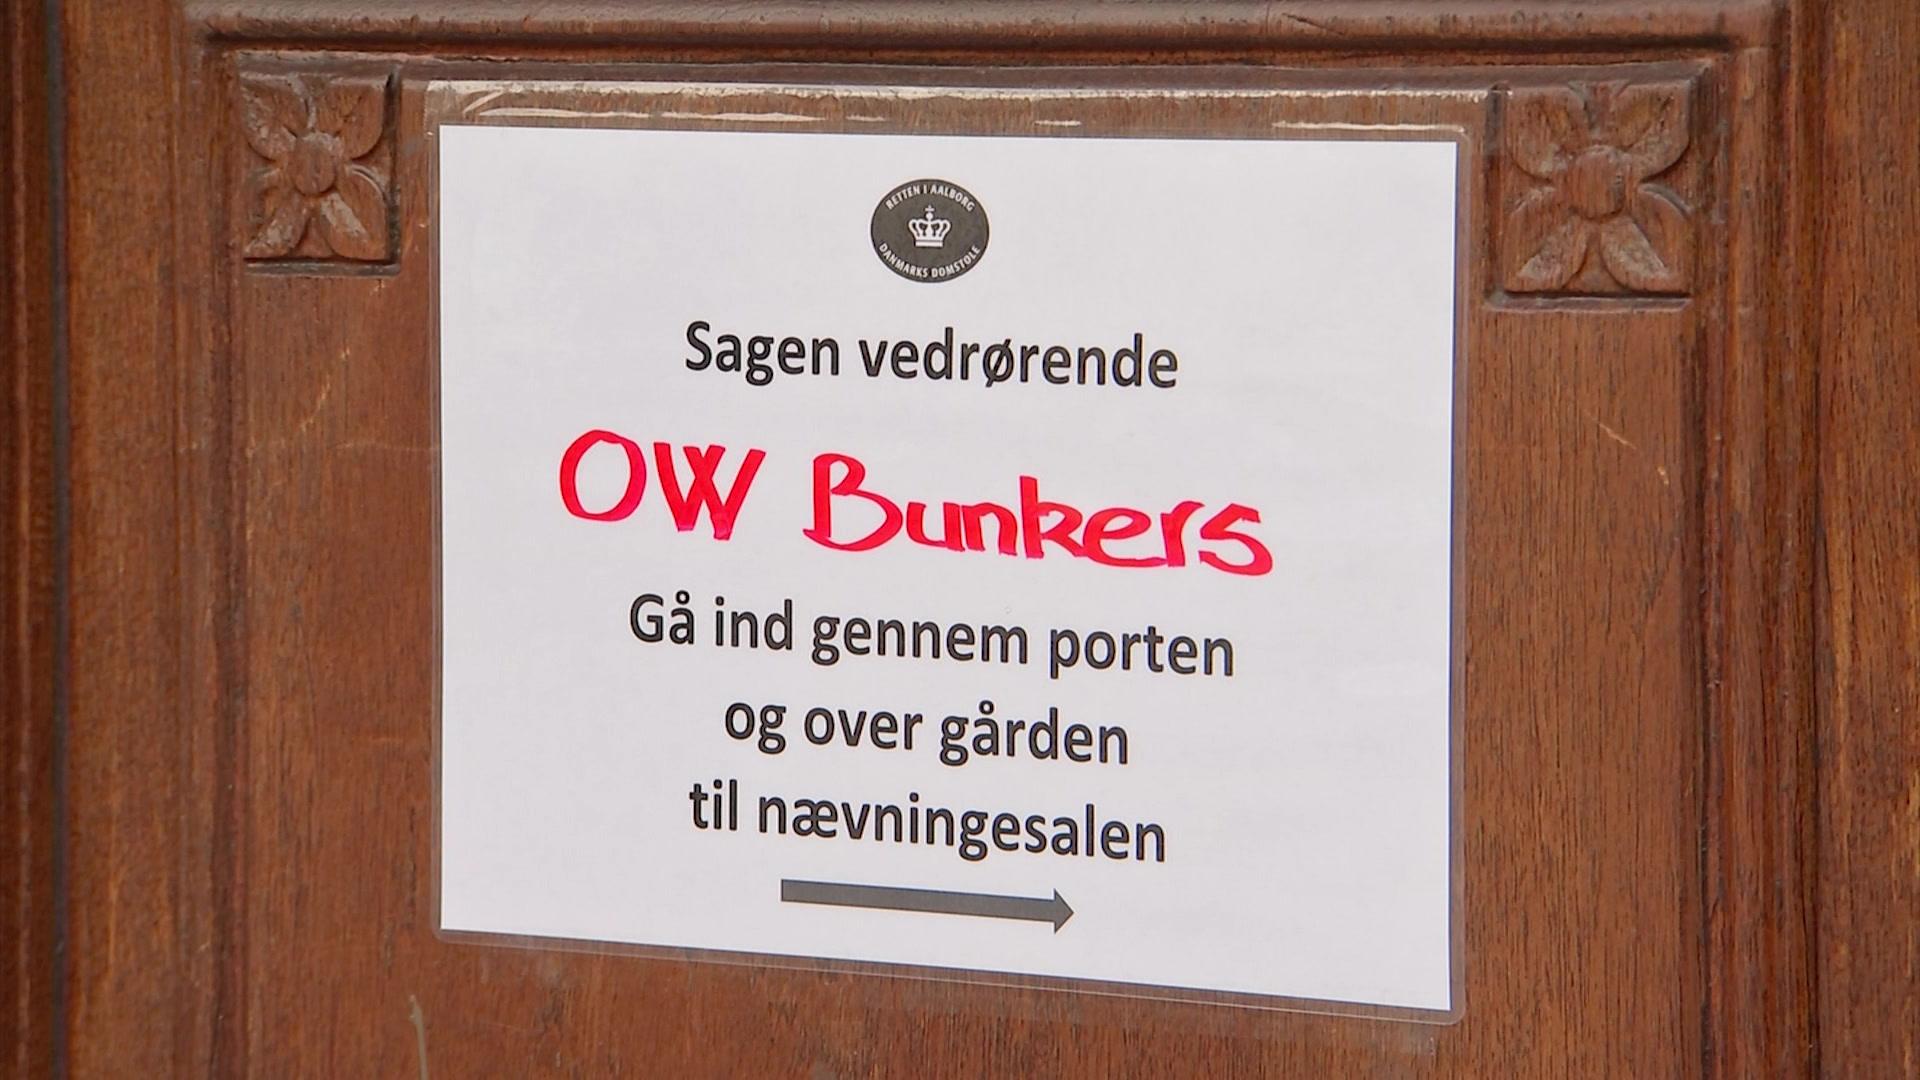 9811954_somm_indland_ow_bunker_hq-00.02.50.19.jpg